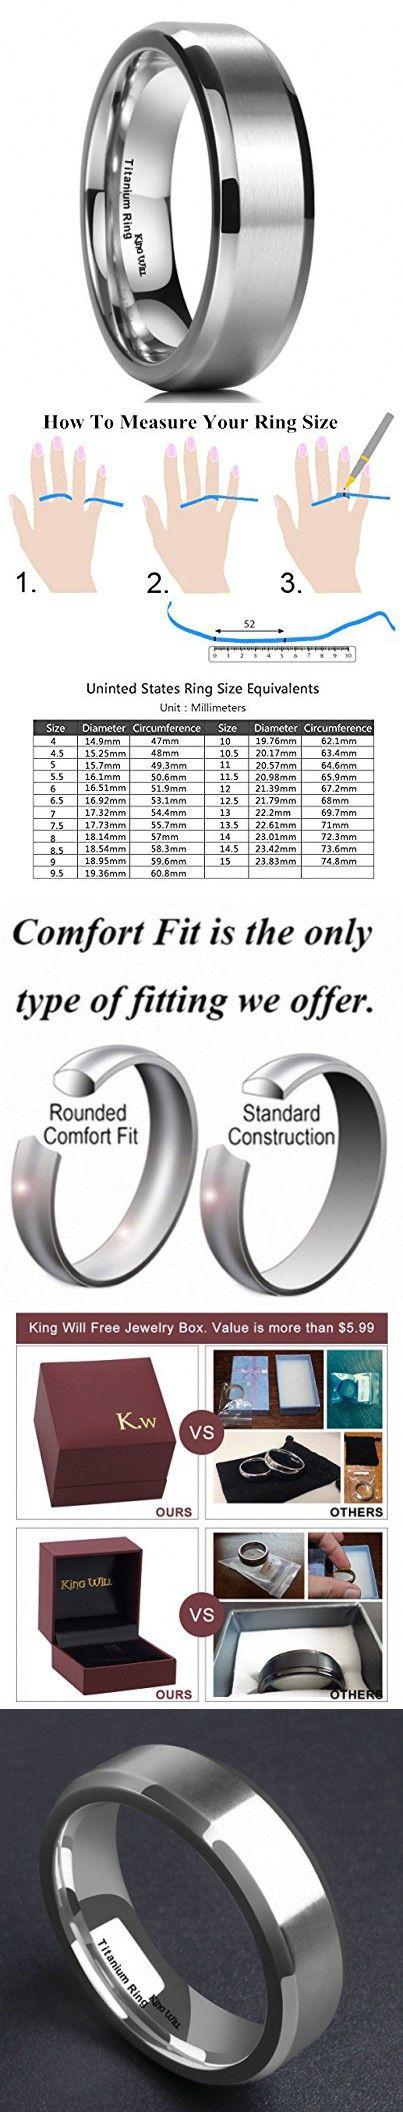 King Will 7MM Titanium Ring Brushed/Matte Comfort Fit Wedding Band For Men (12.5)